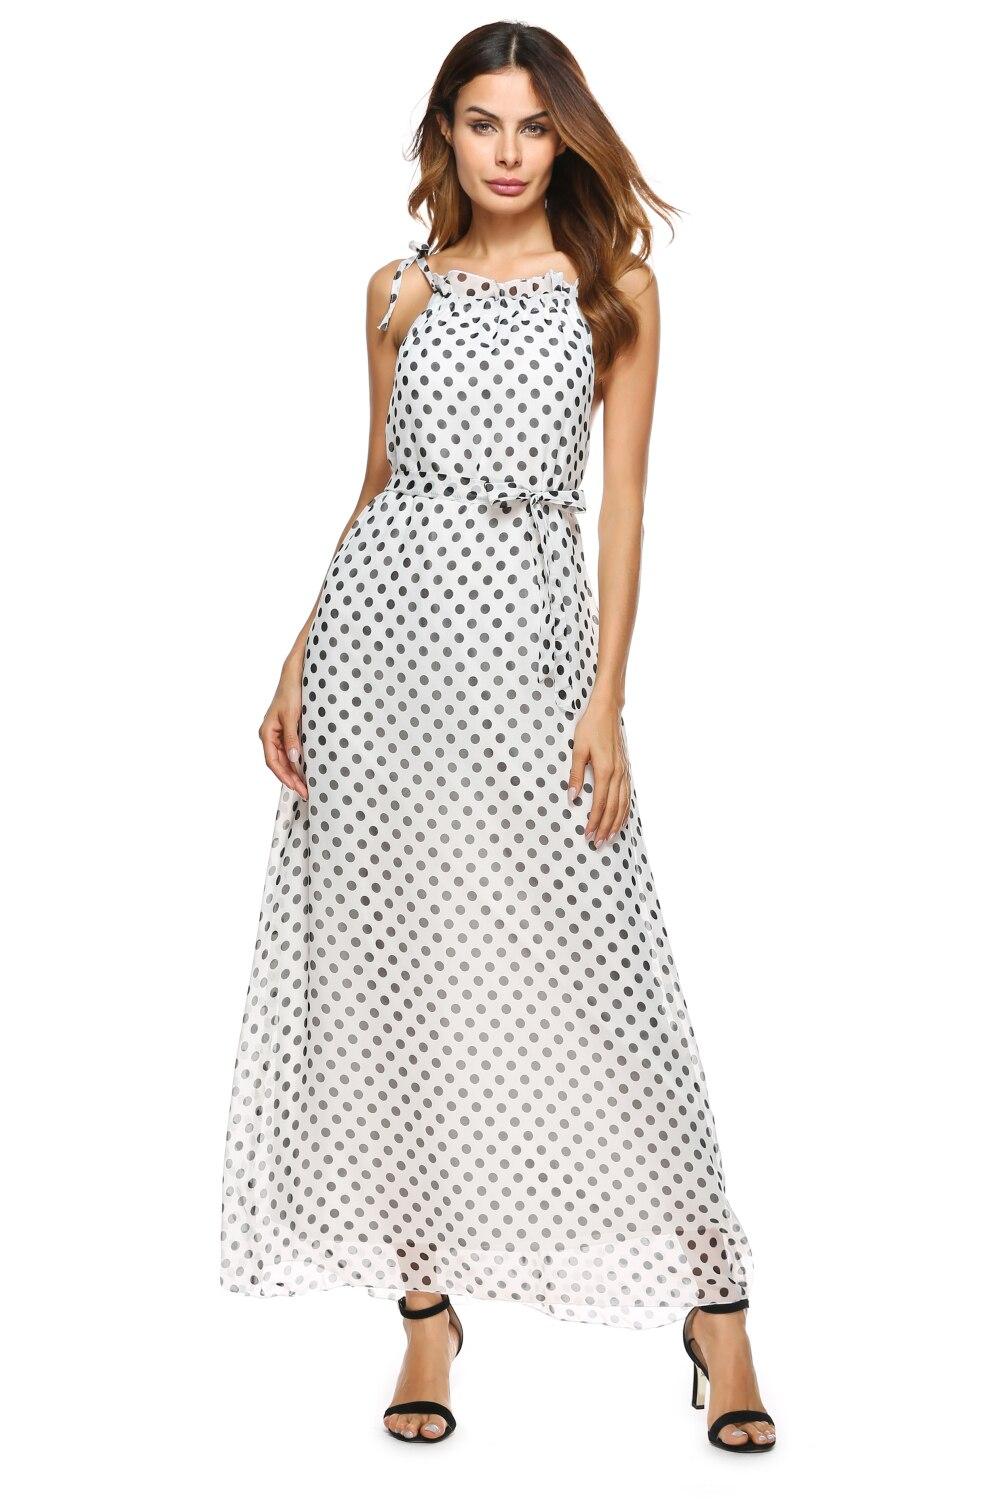 Dress up diary baju pelaut - Musim Panas Gaya Fashion Tinggi Gaun Putih New Fashion Desain Manis Lucu Polka Dot Pola Dicetak